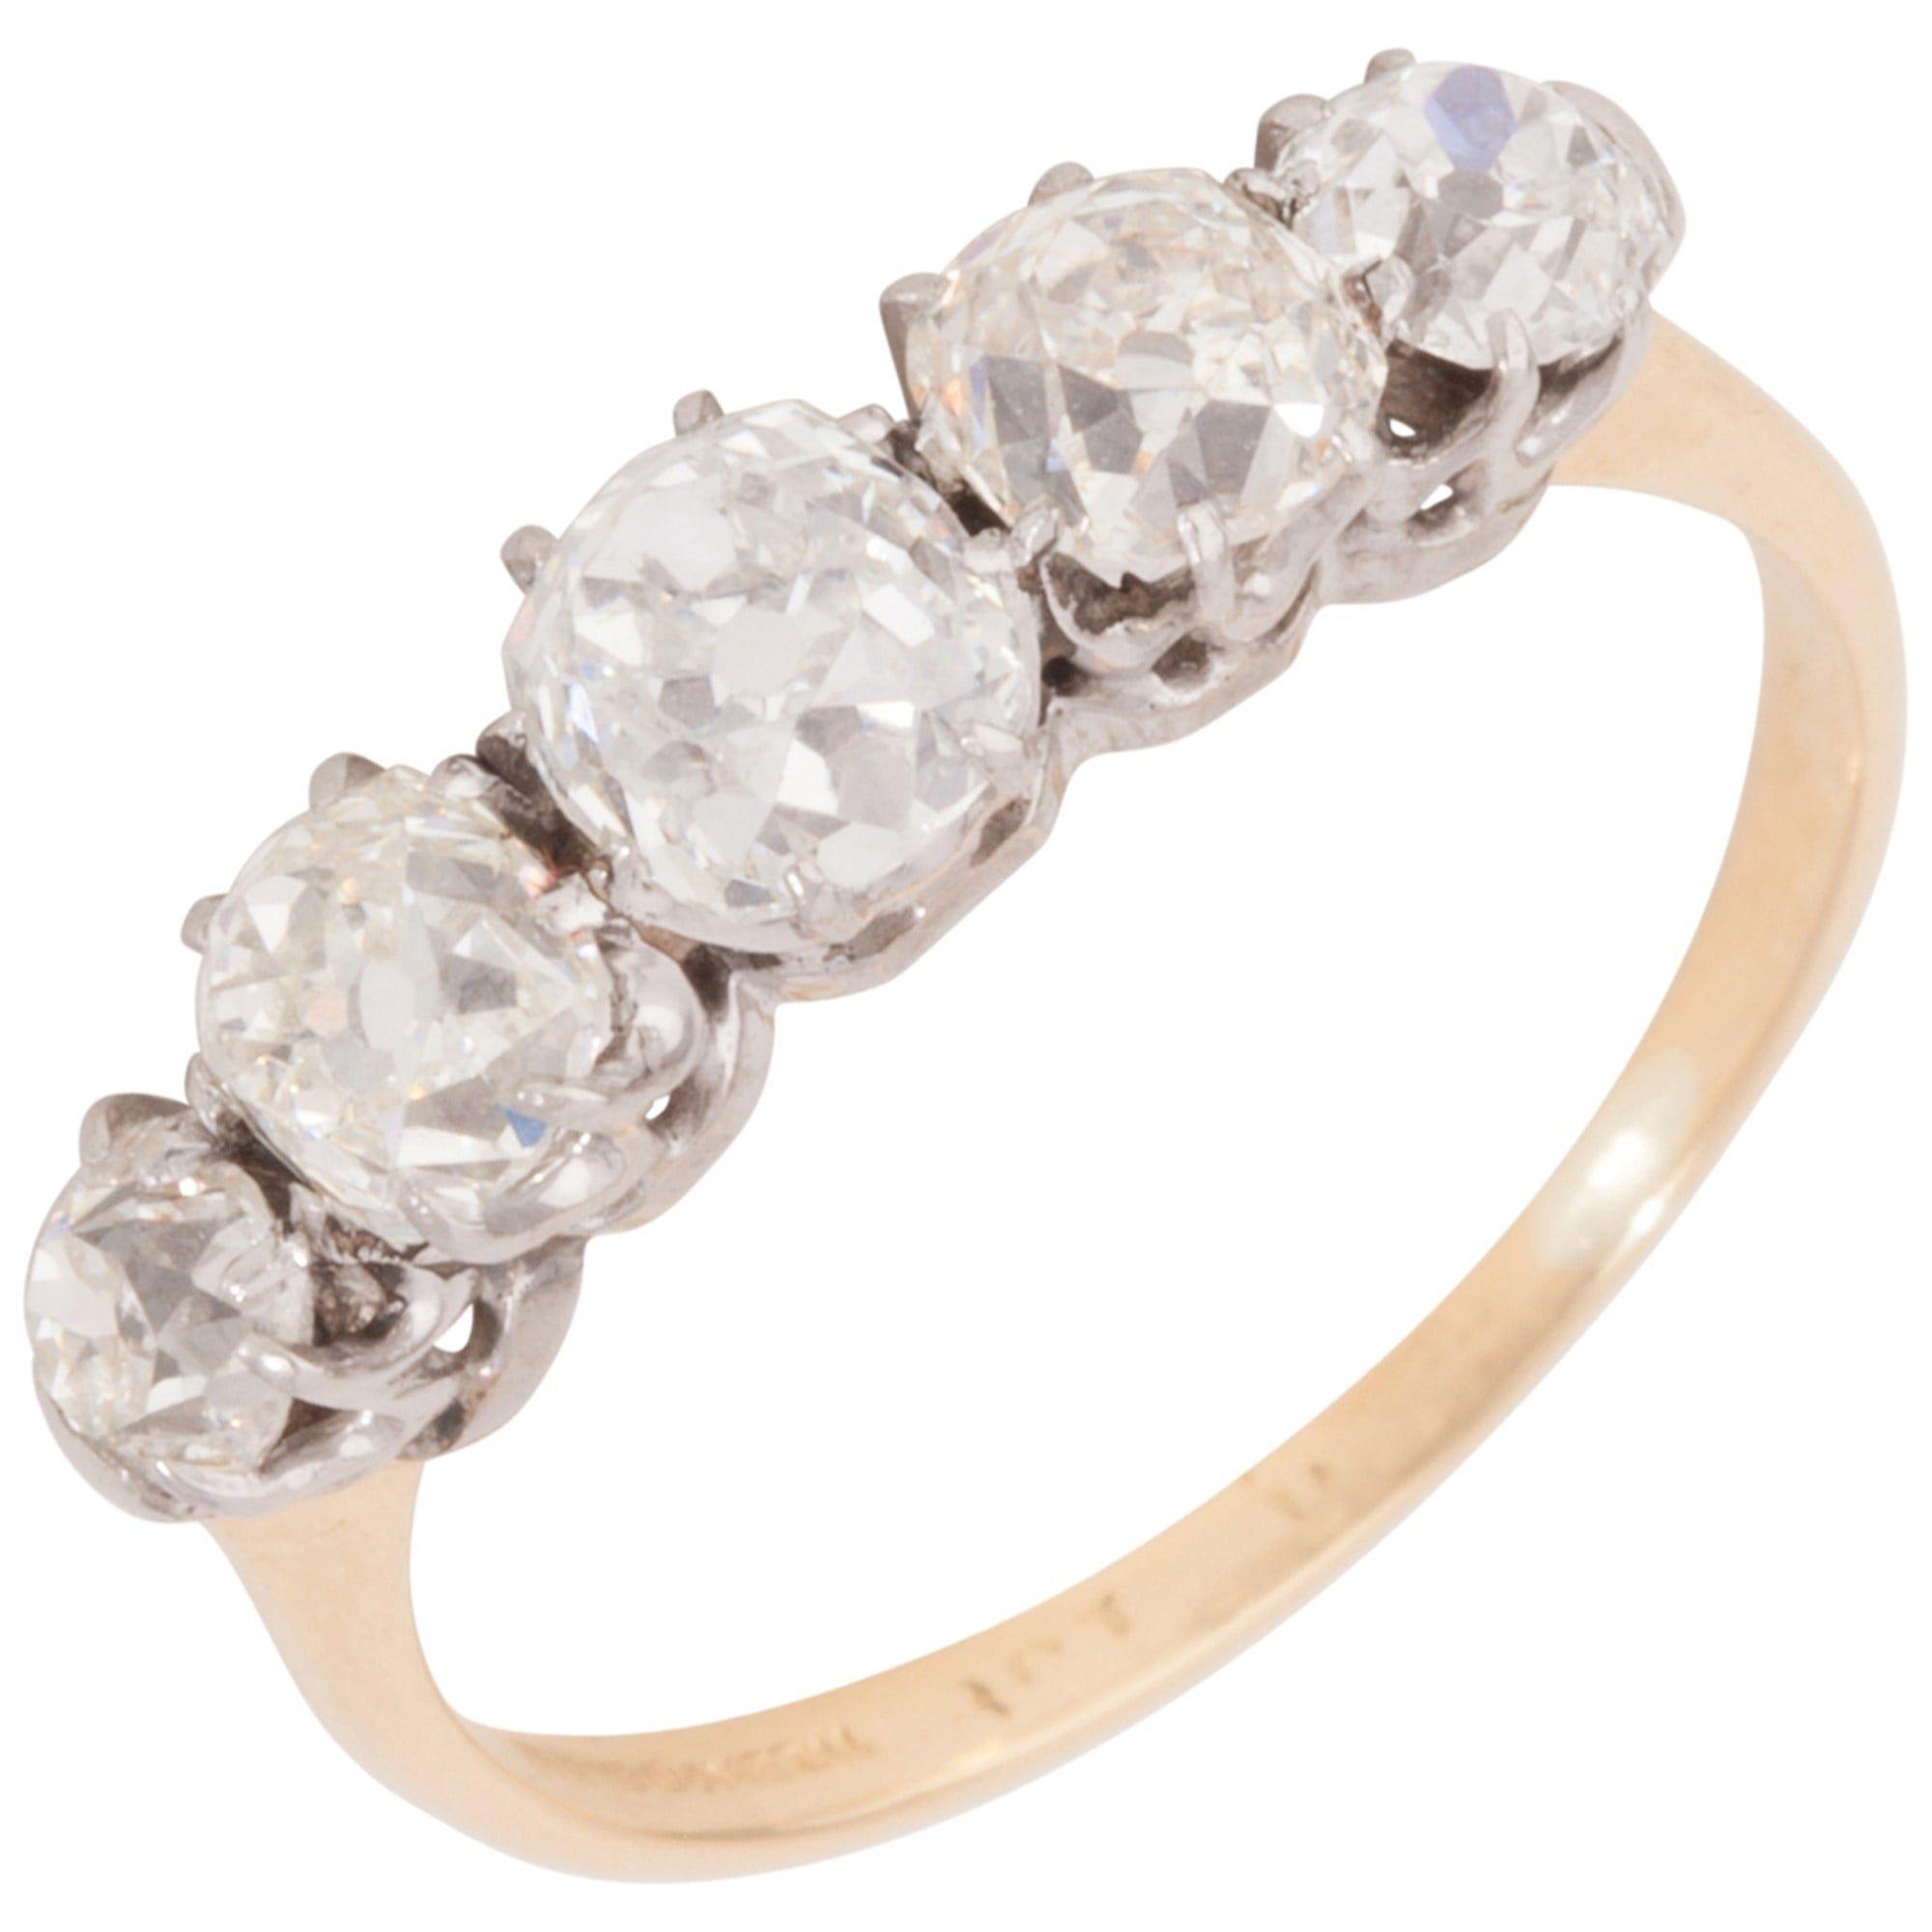 236454ba8ddbb Pre-Owned 18ct Yellow Gold 1.20 Carat Old Cut Diamond Dress Ring ...